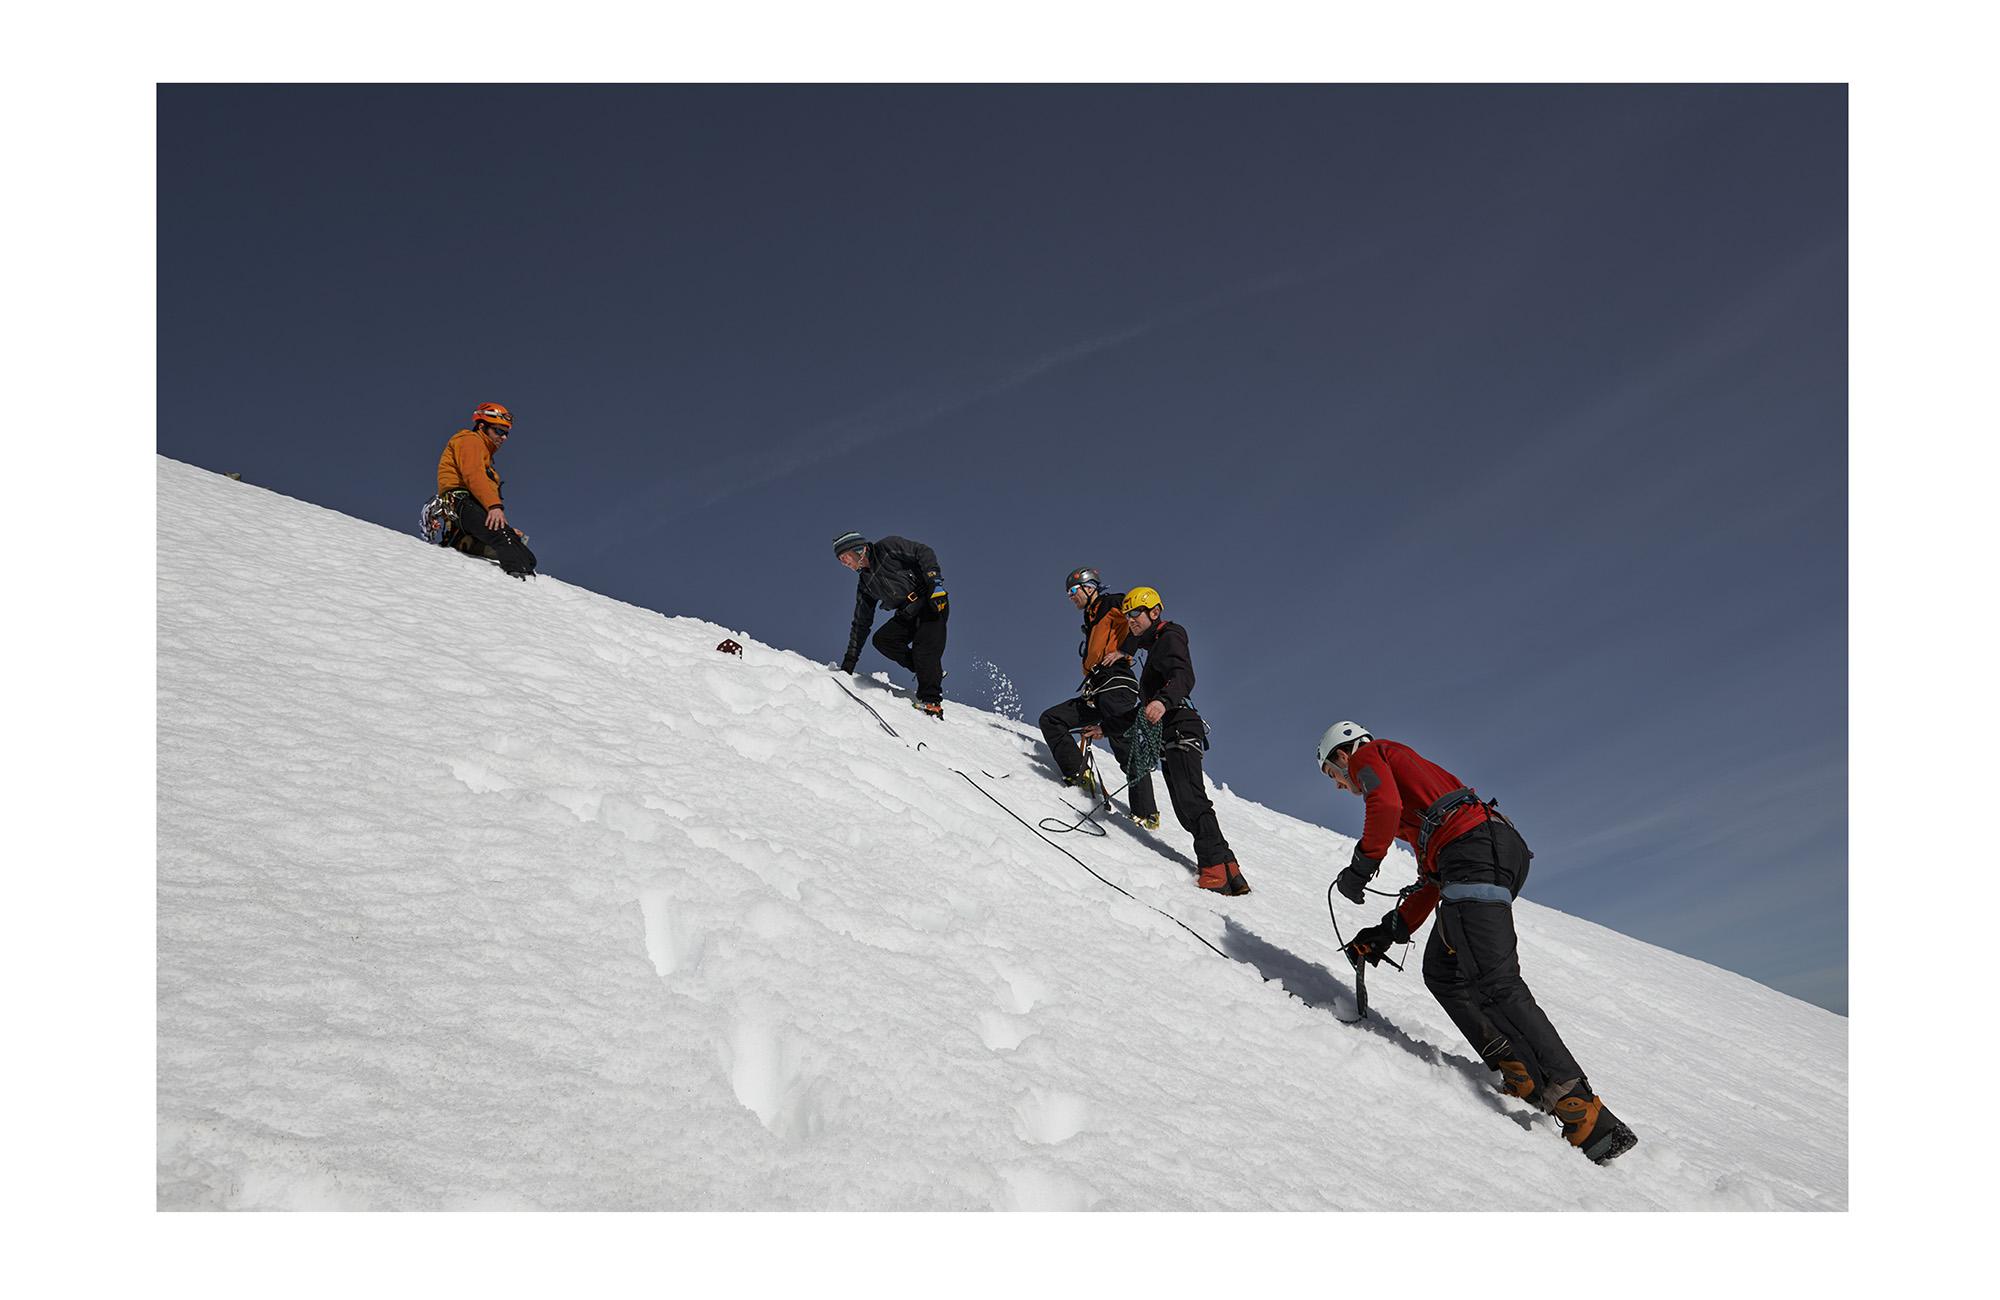 Hole and Corner | Glencoe Rescue Team - 6 of 14